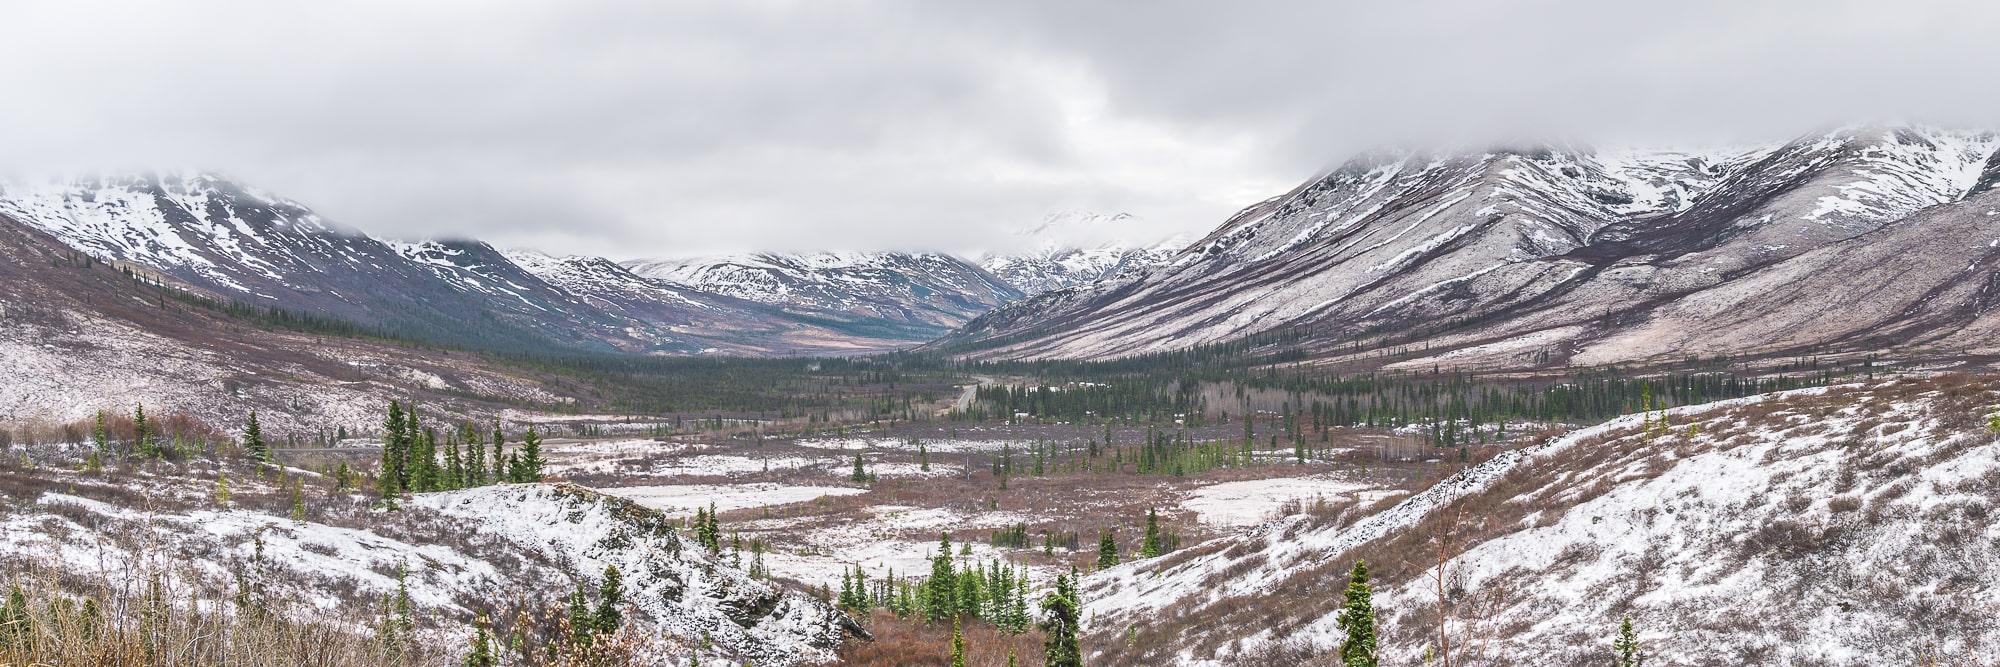 Dempster Highway views Yukon road trip